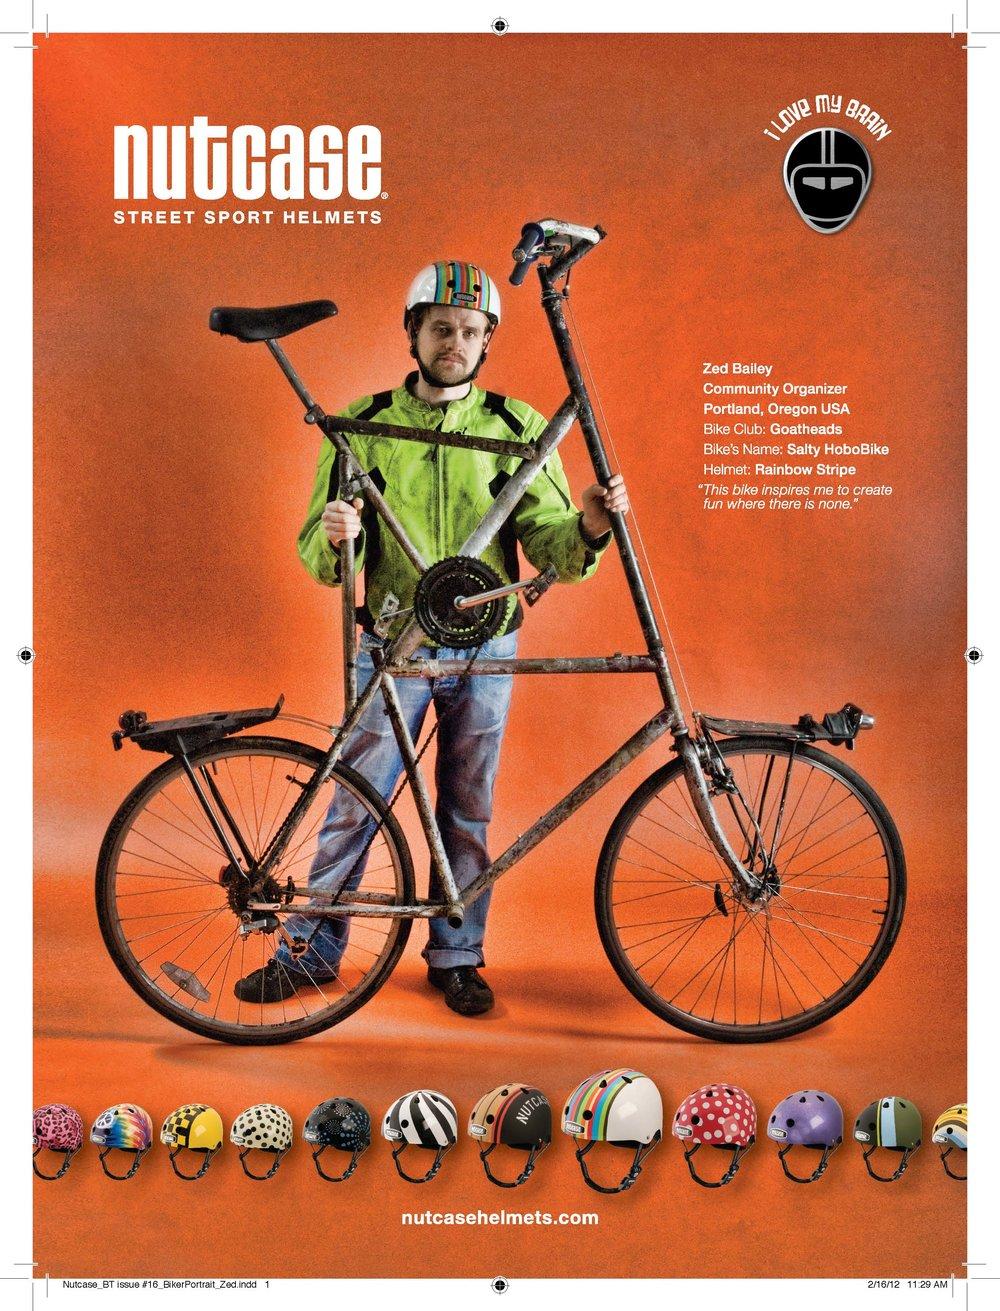 Nutcase_BT issue #16_BikerPortrait_Zed.jpg